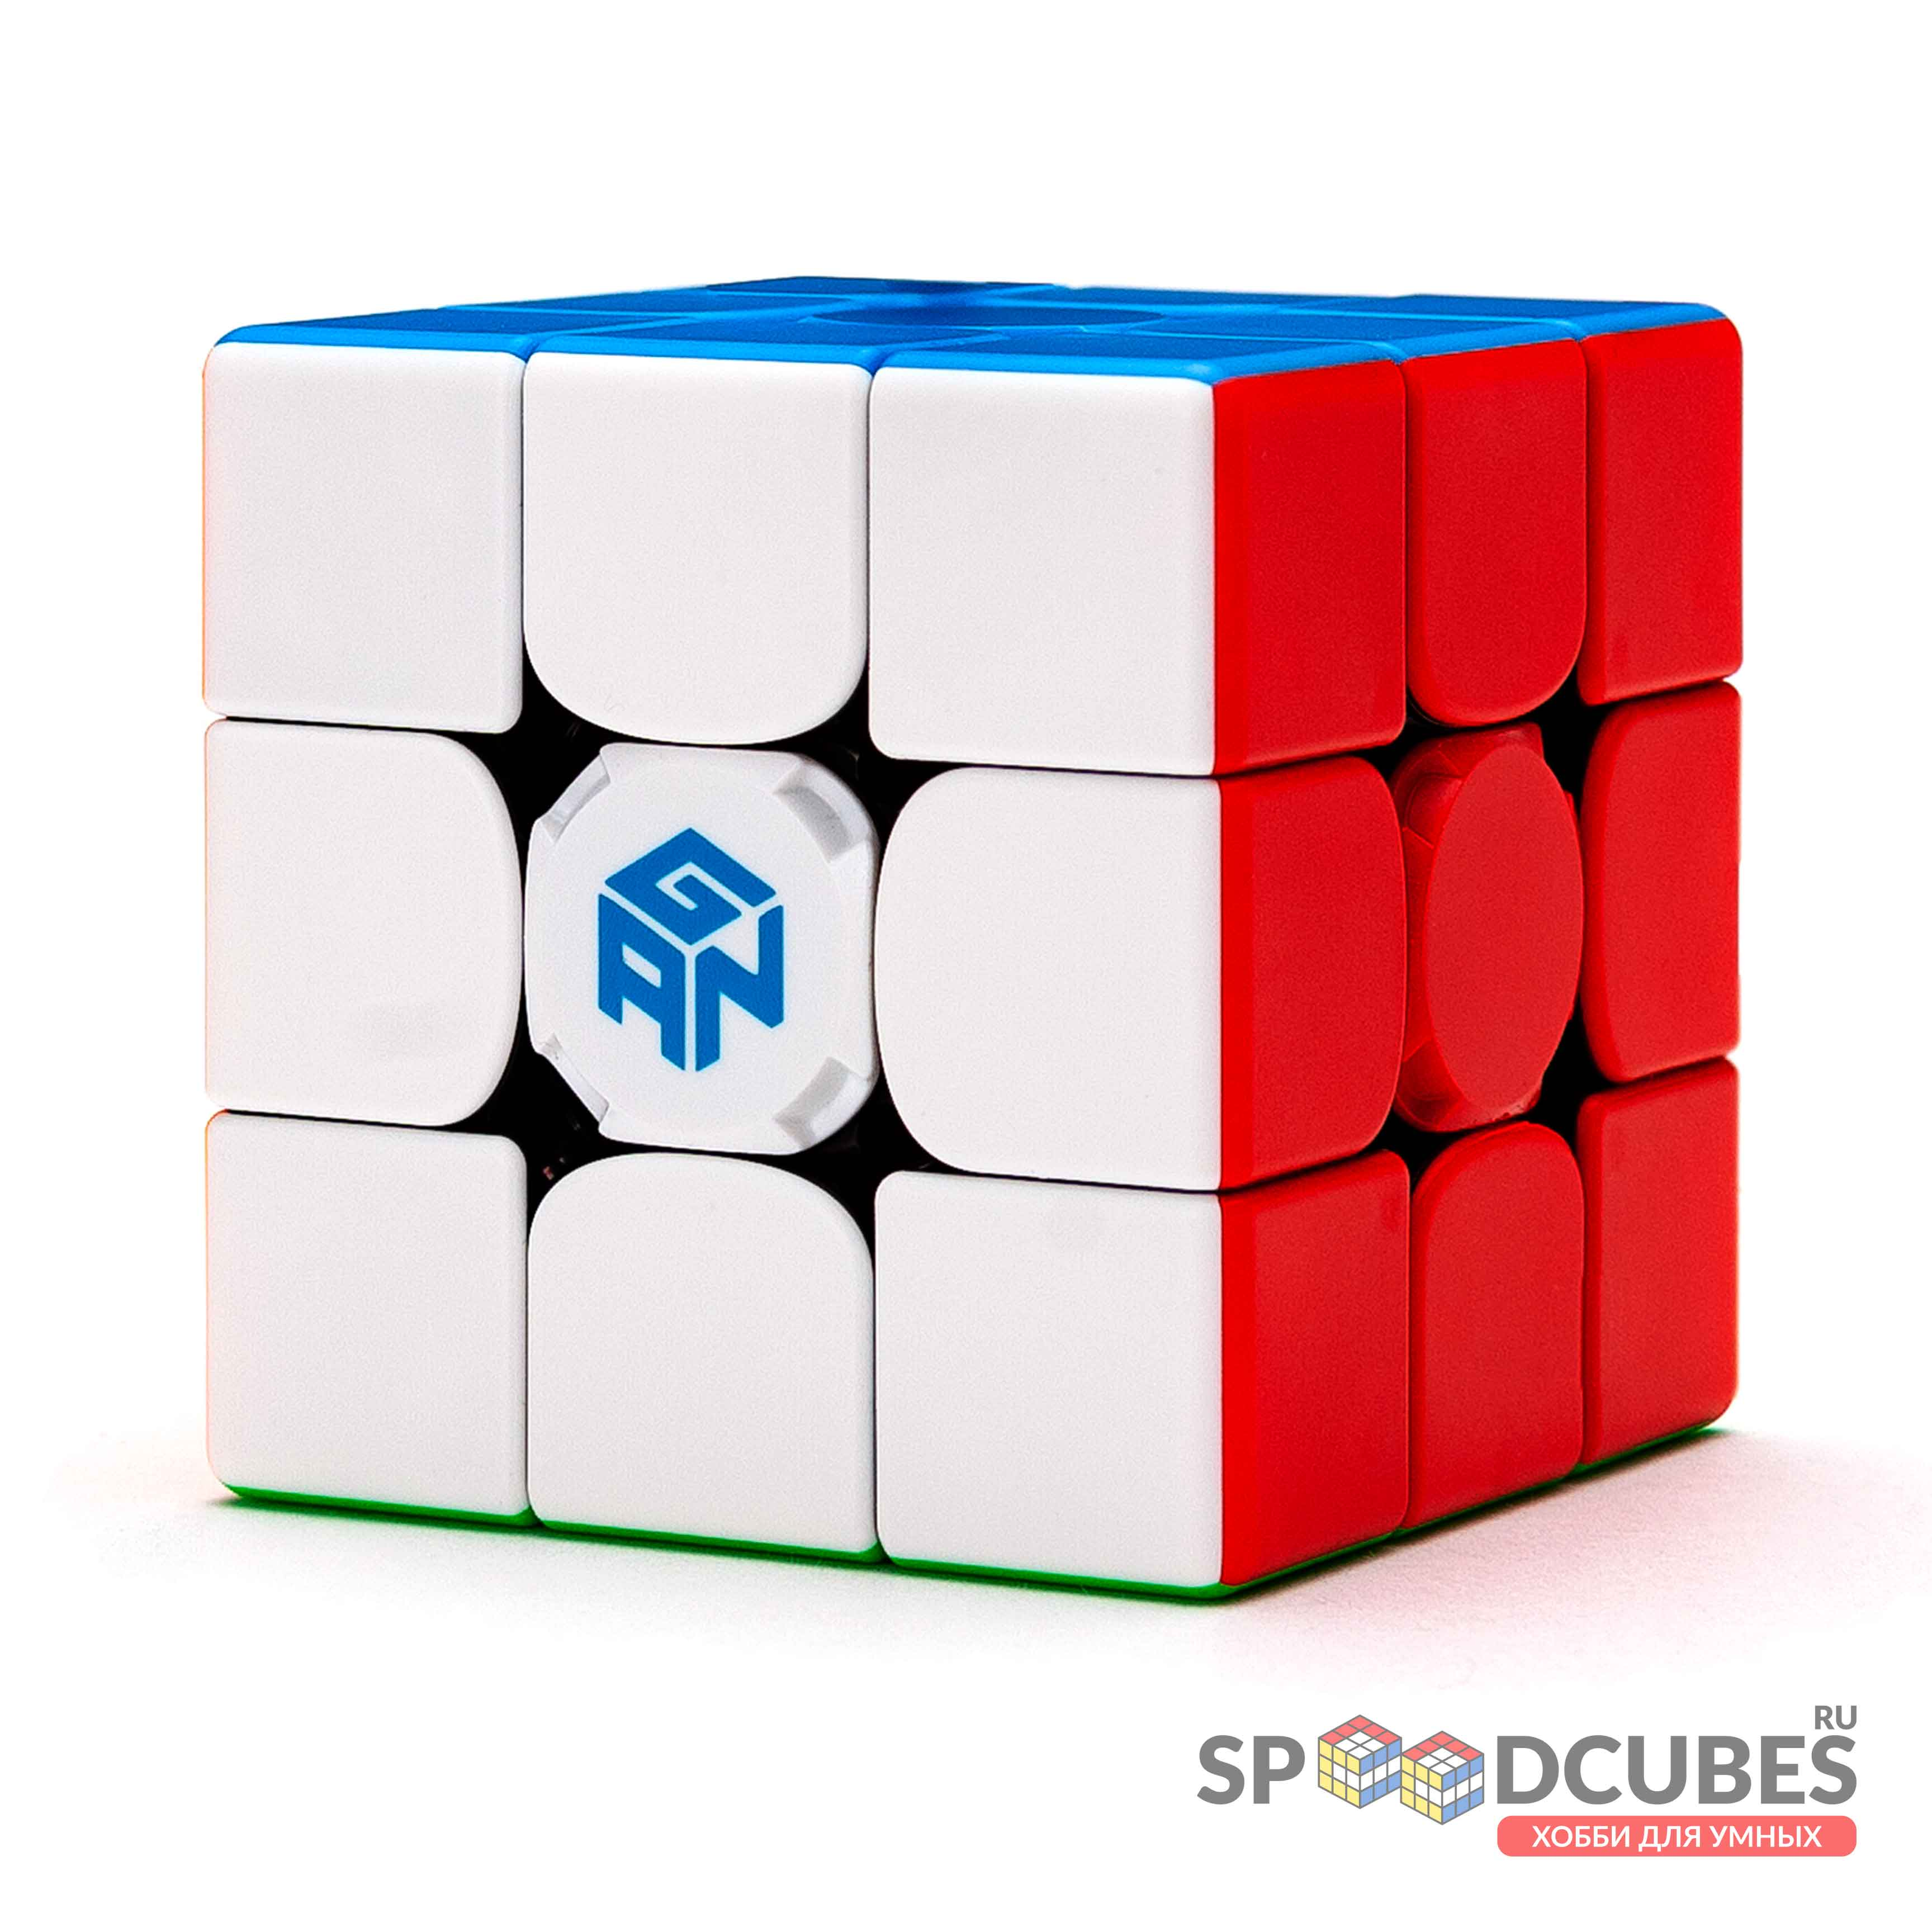 Gan 356 I Play 3x3 Magnetic